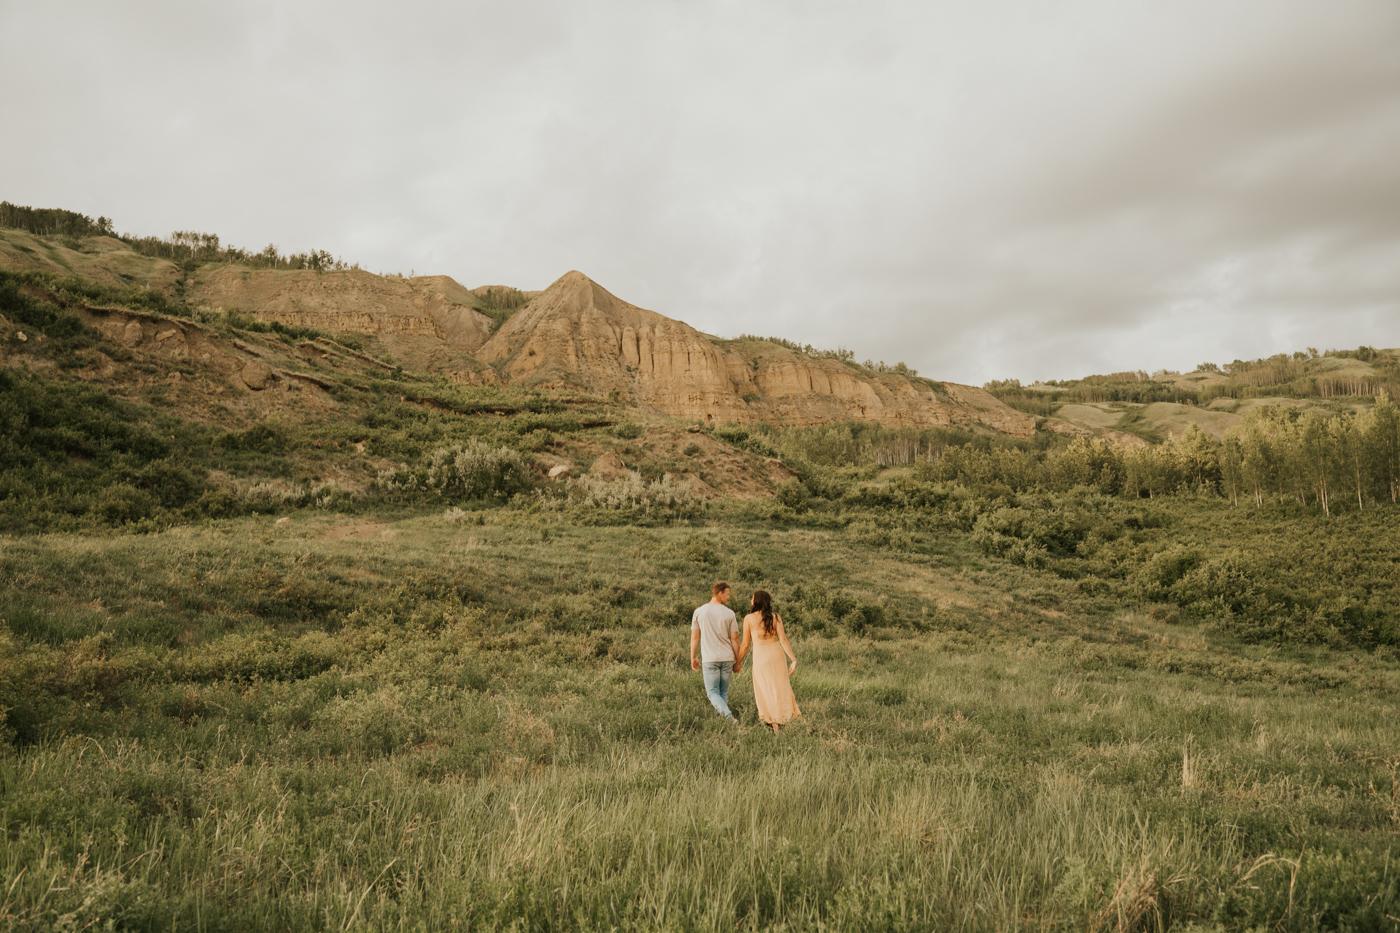 tyraephotography_photographer_wedding_elopement_engagement_photography-04444.jpg